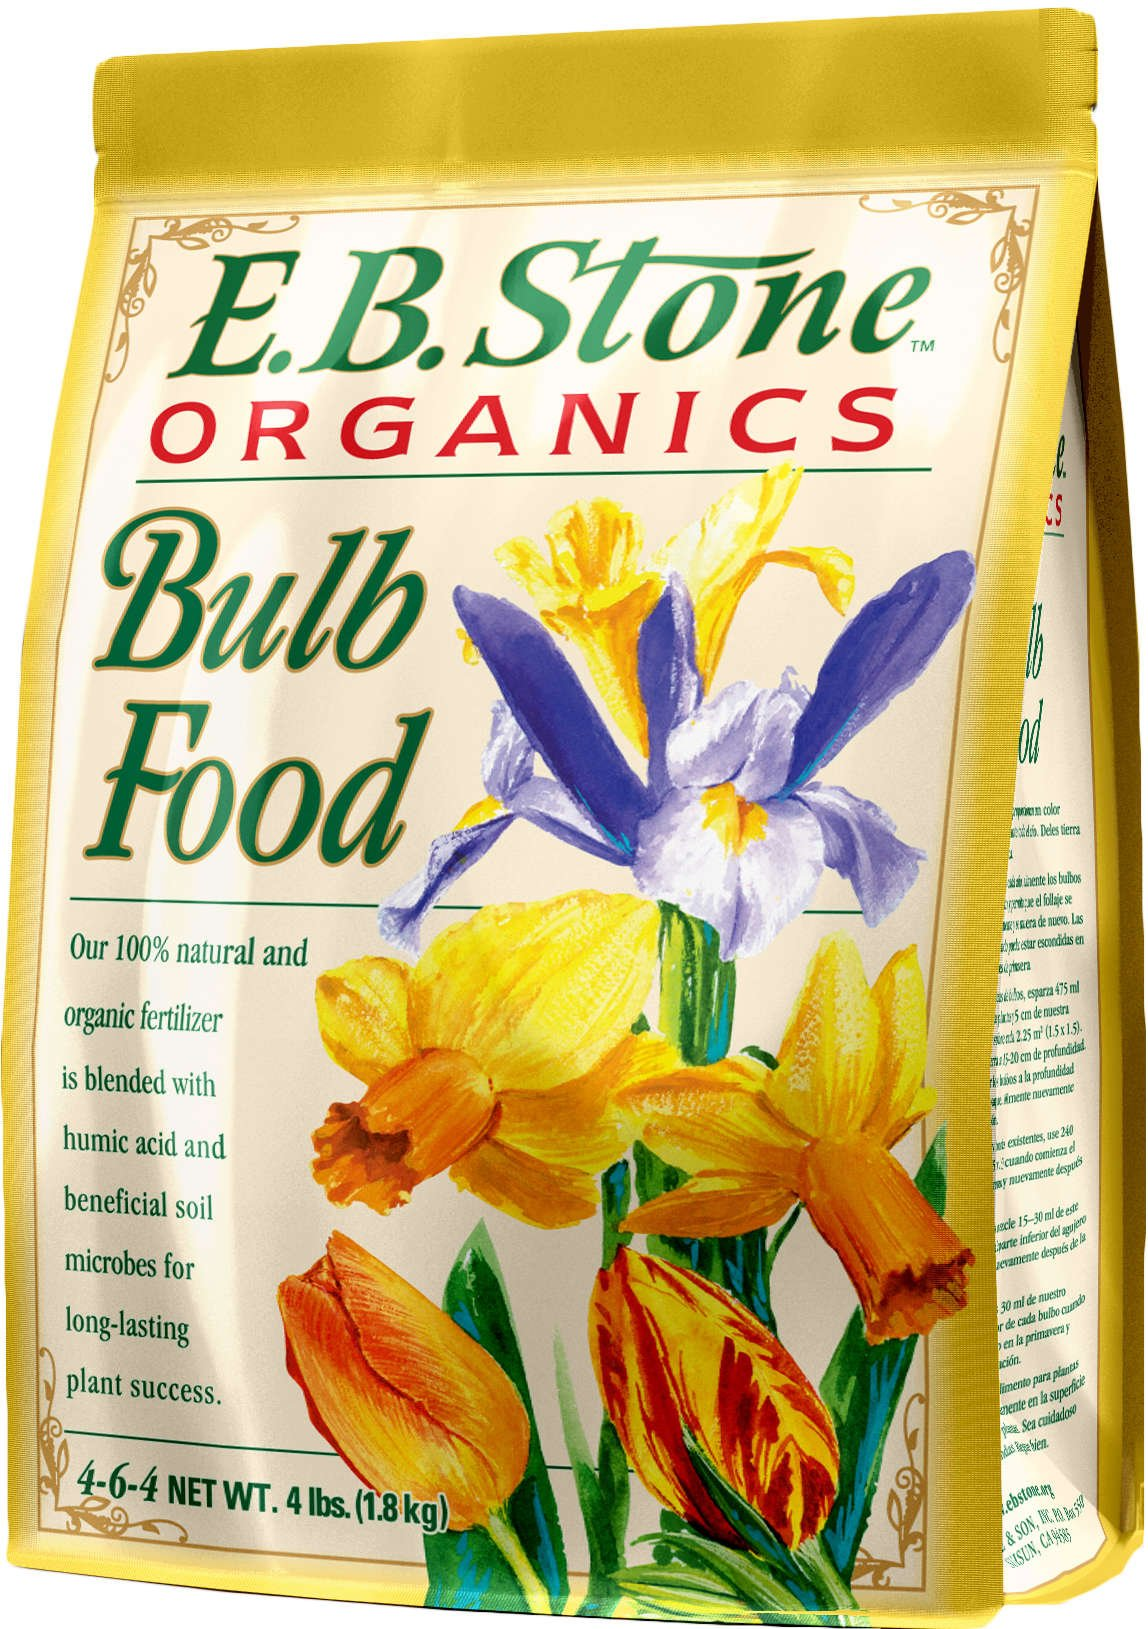 EB Stone Bulb Food